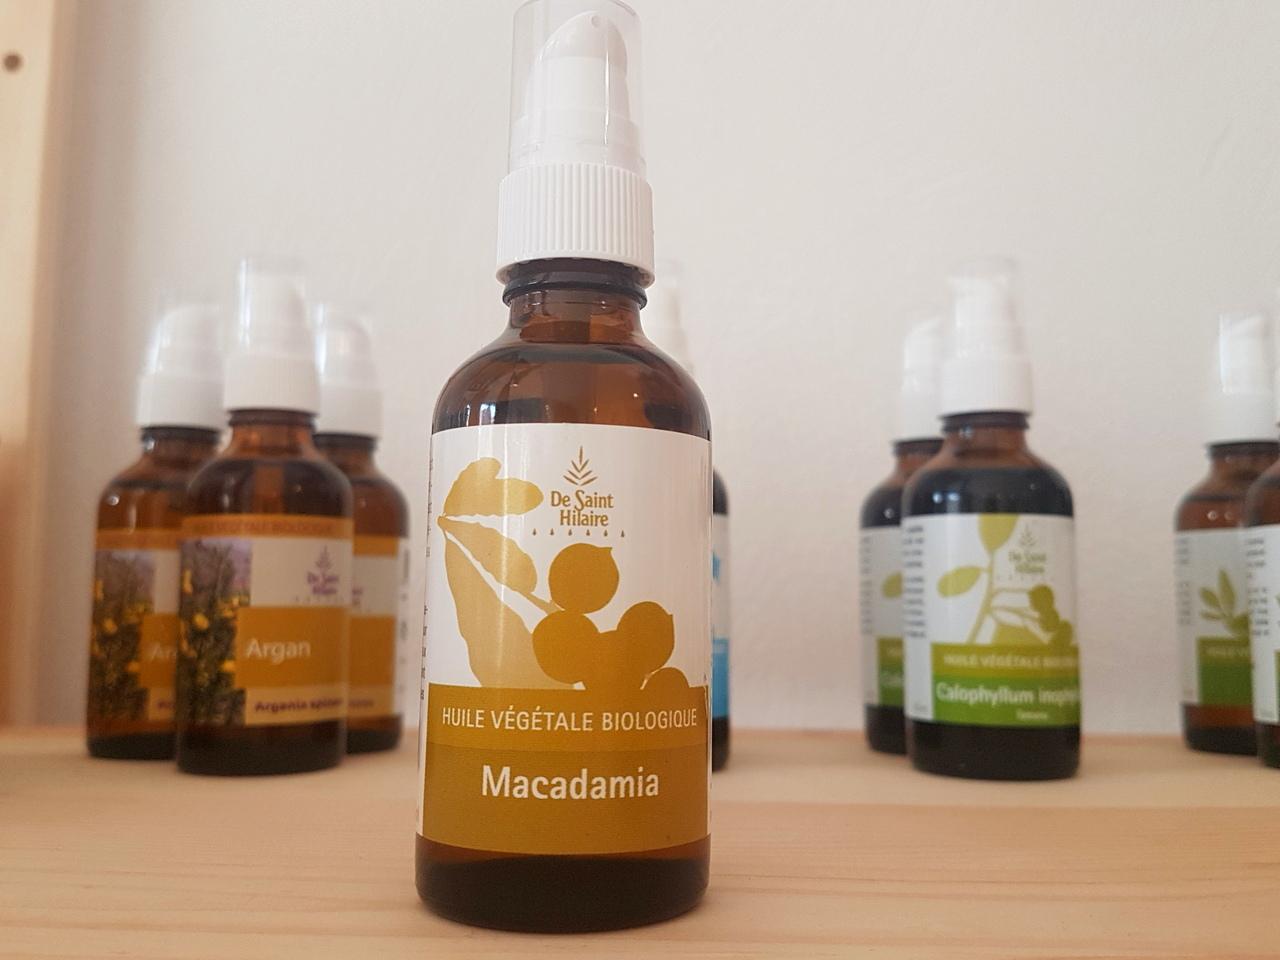 Hv macadamia 1